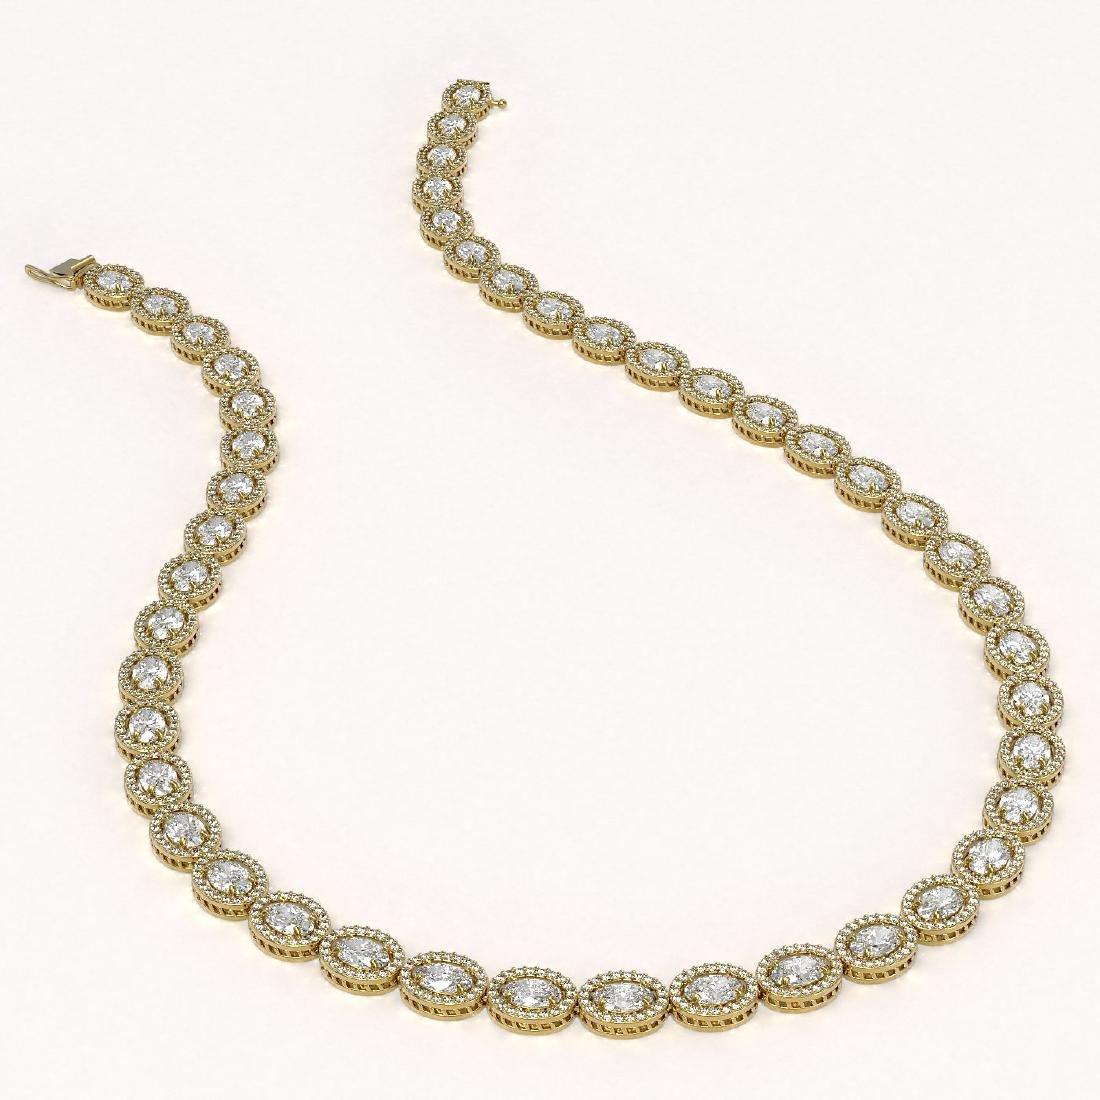 34.96 CTW Oval Diamond Designer Necklace 18K Yellow